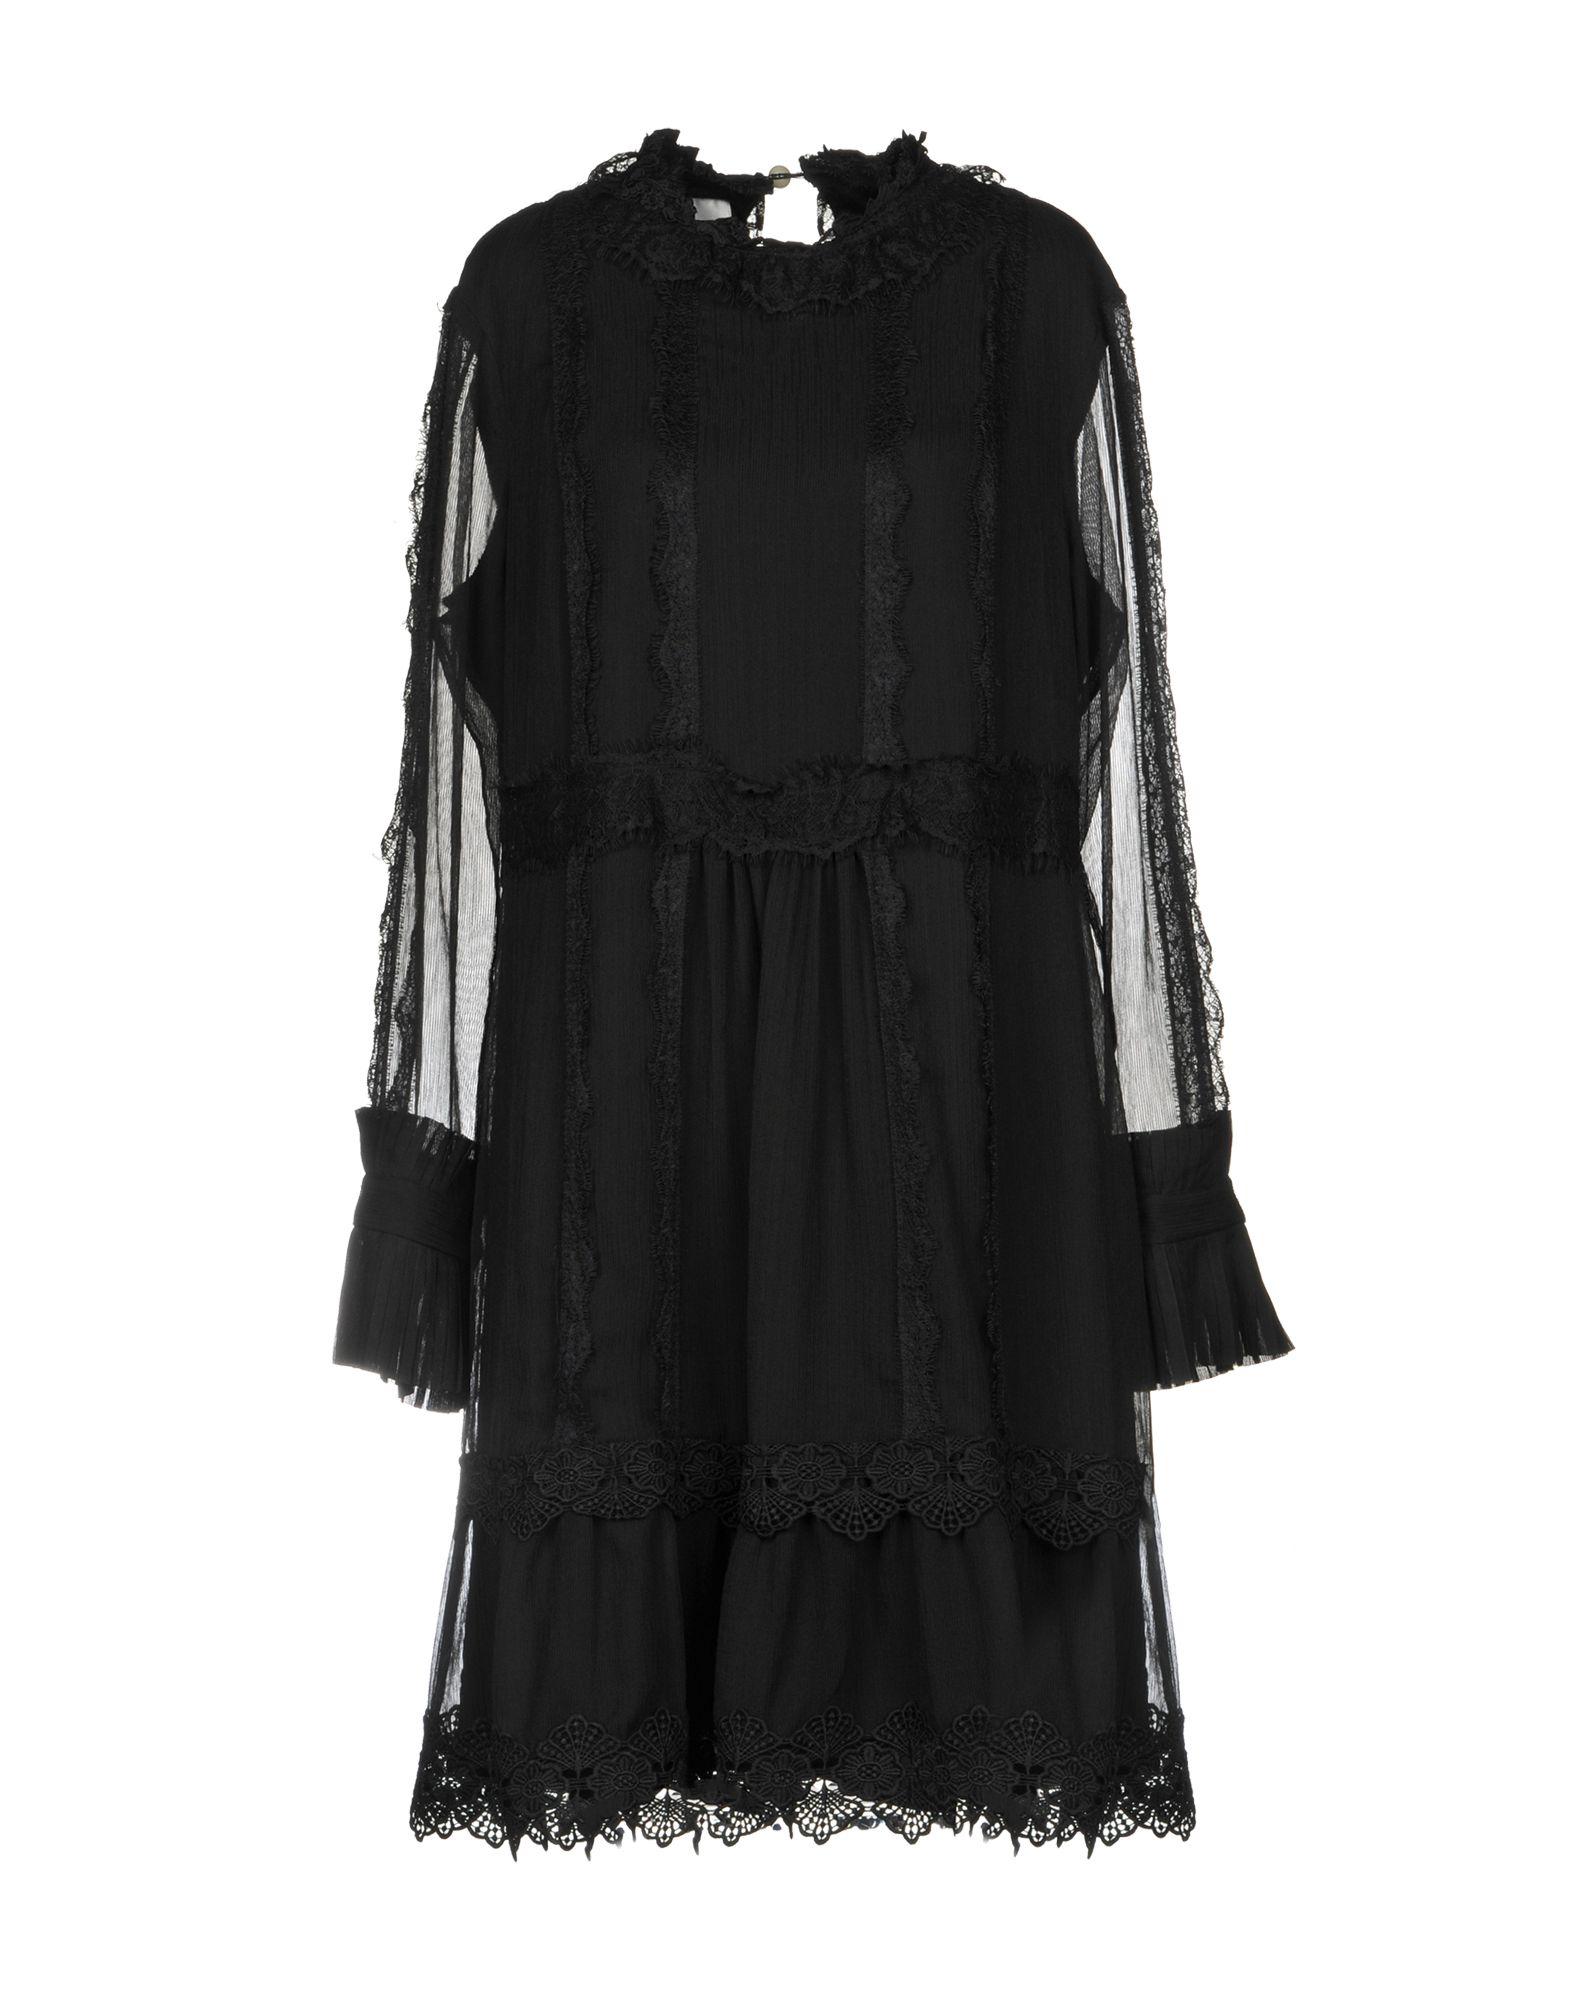 EDWARD ACHOUR | EDWARD ACHOUR Short dresses | Goxip